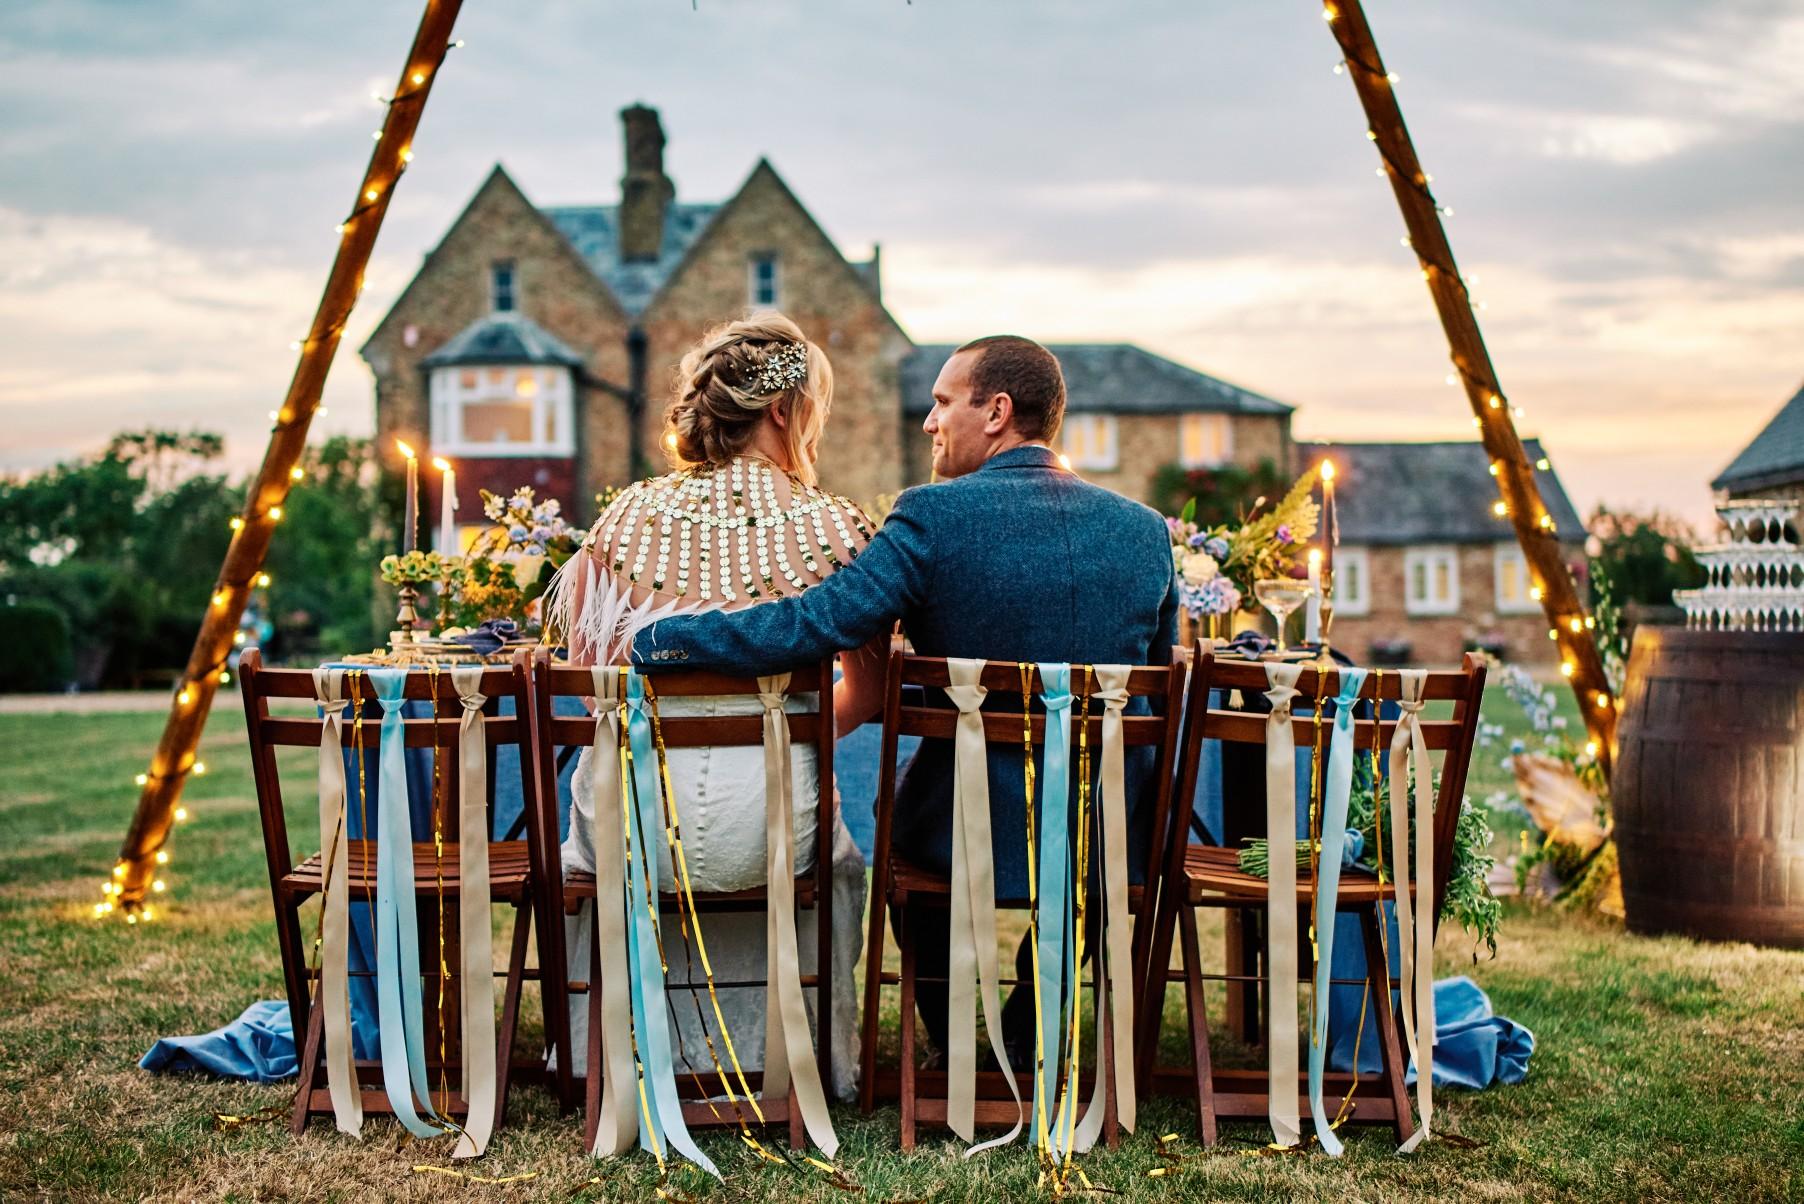 nhs wedding - paramedic wedding - blue and gold wedding - outdoor wedding - micro wedding - surprise wedding - outdoor wedding inspiration